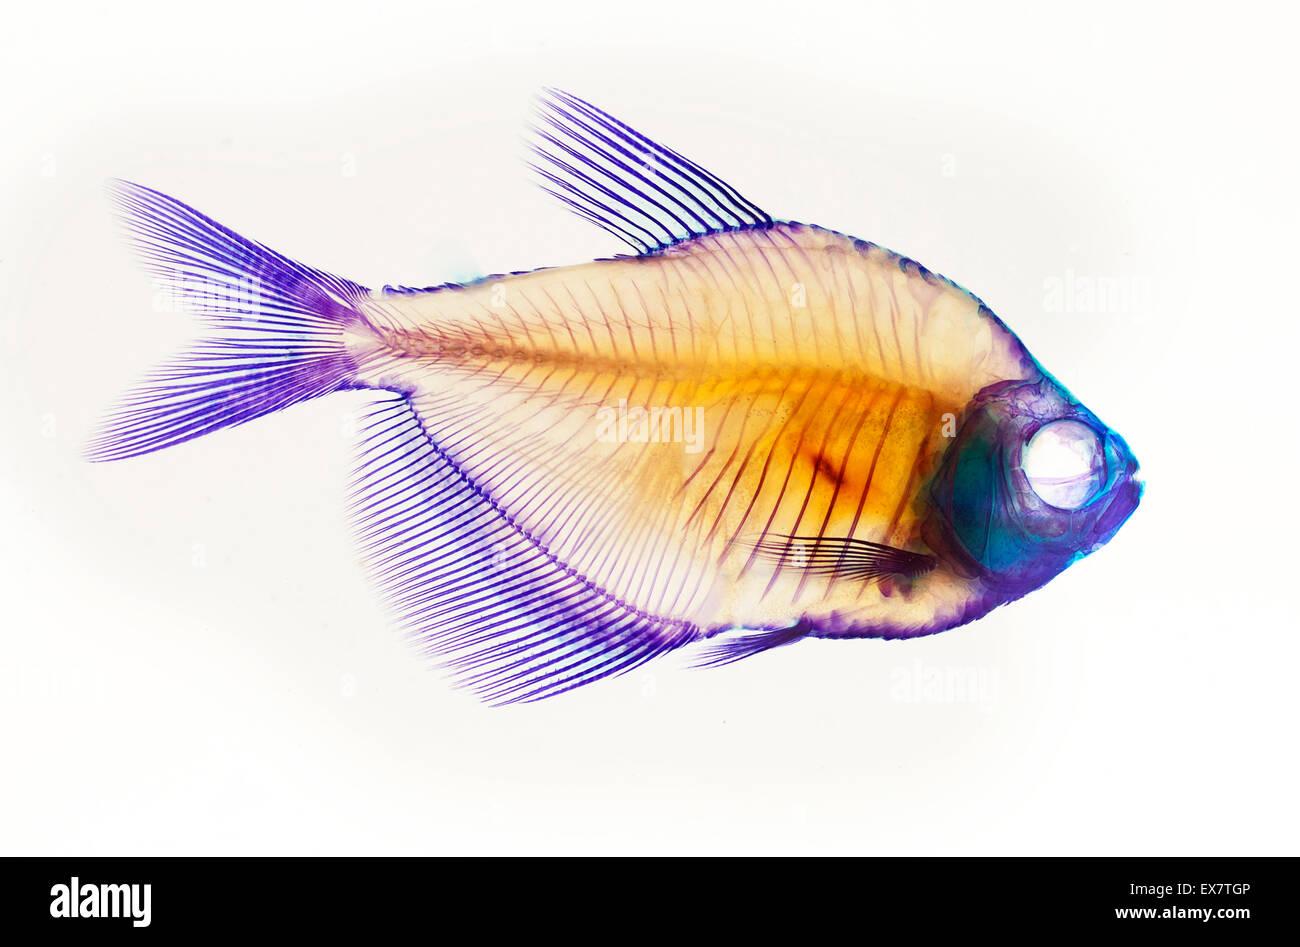 Fish Skeleton Anatomy Stock Photo 84995478 Alamy